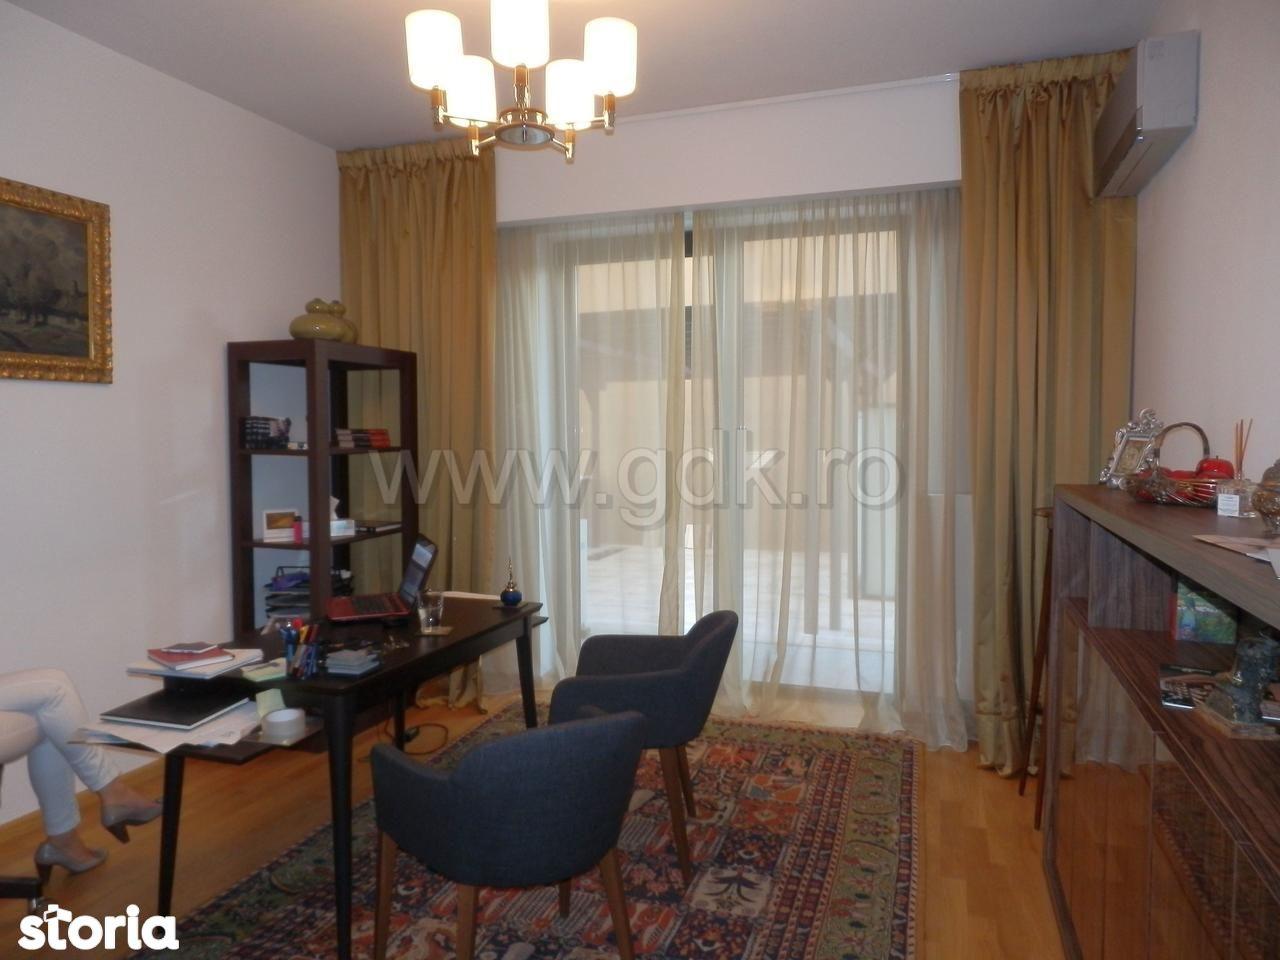 Apartament de inchiriat, București (judet), Strada Gen. Av. Athanasie Enescu - Foto 14